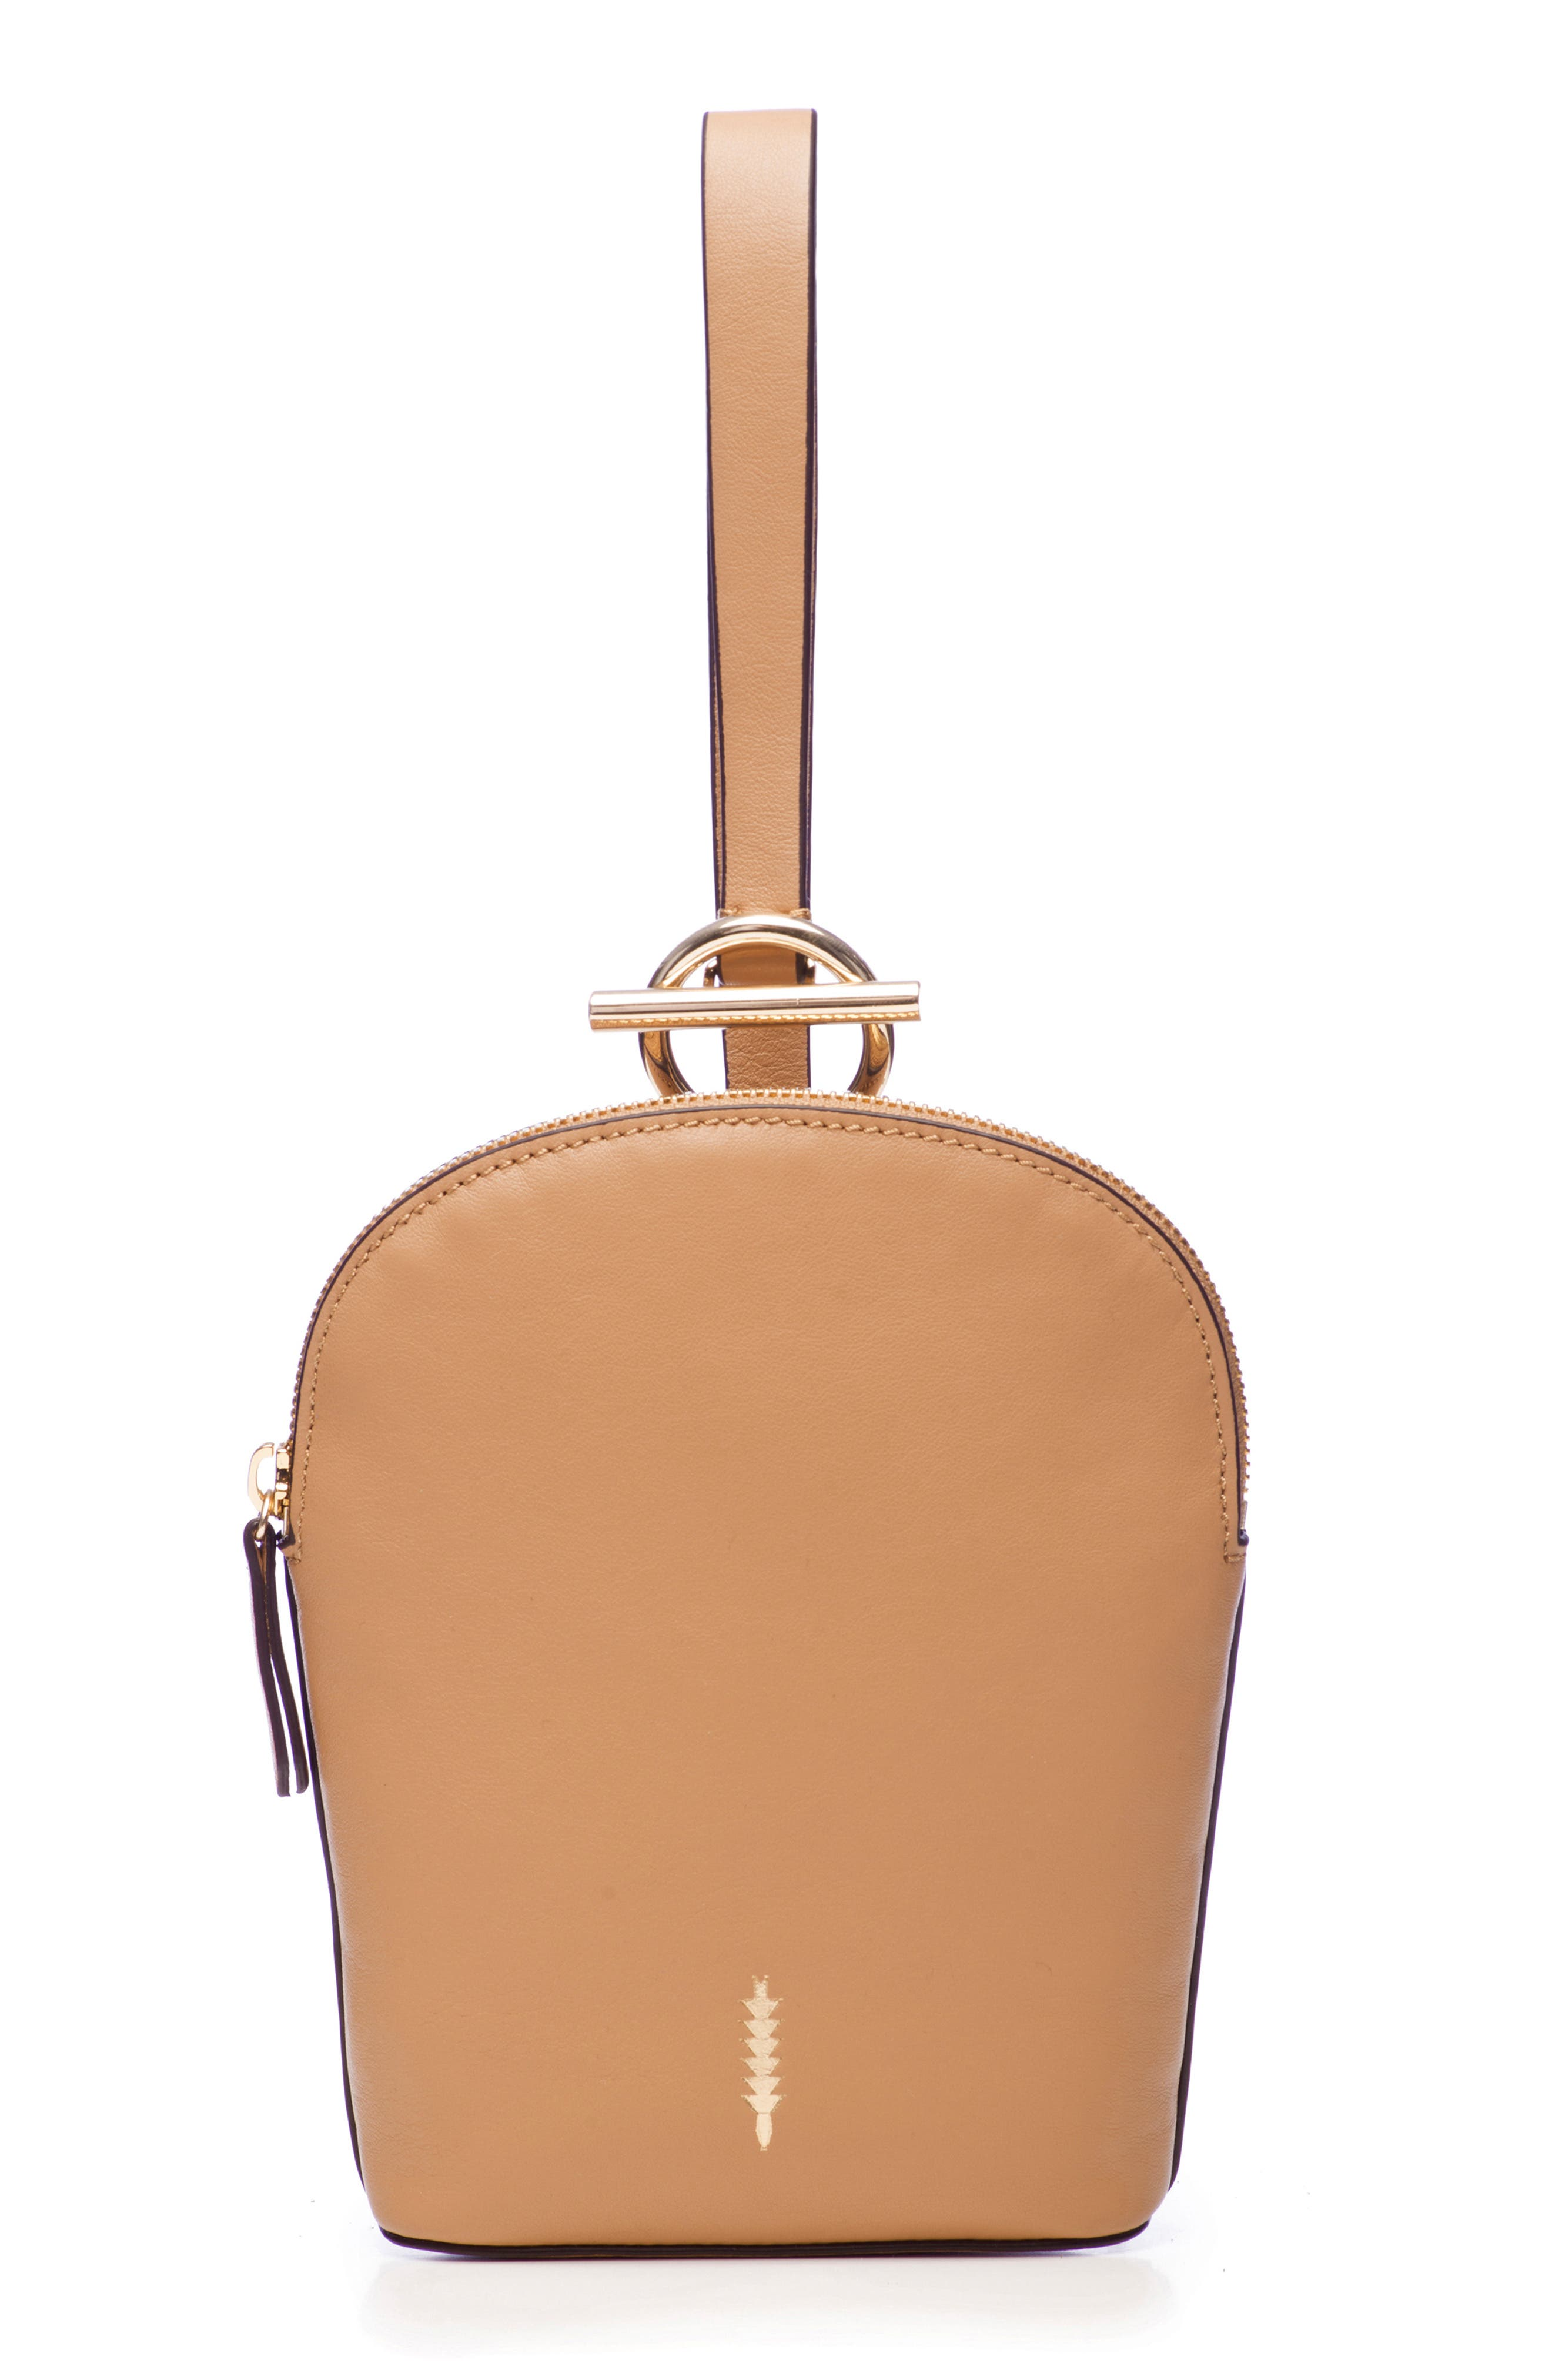 Thacker Ava Leather Wristlet - Brown